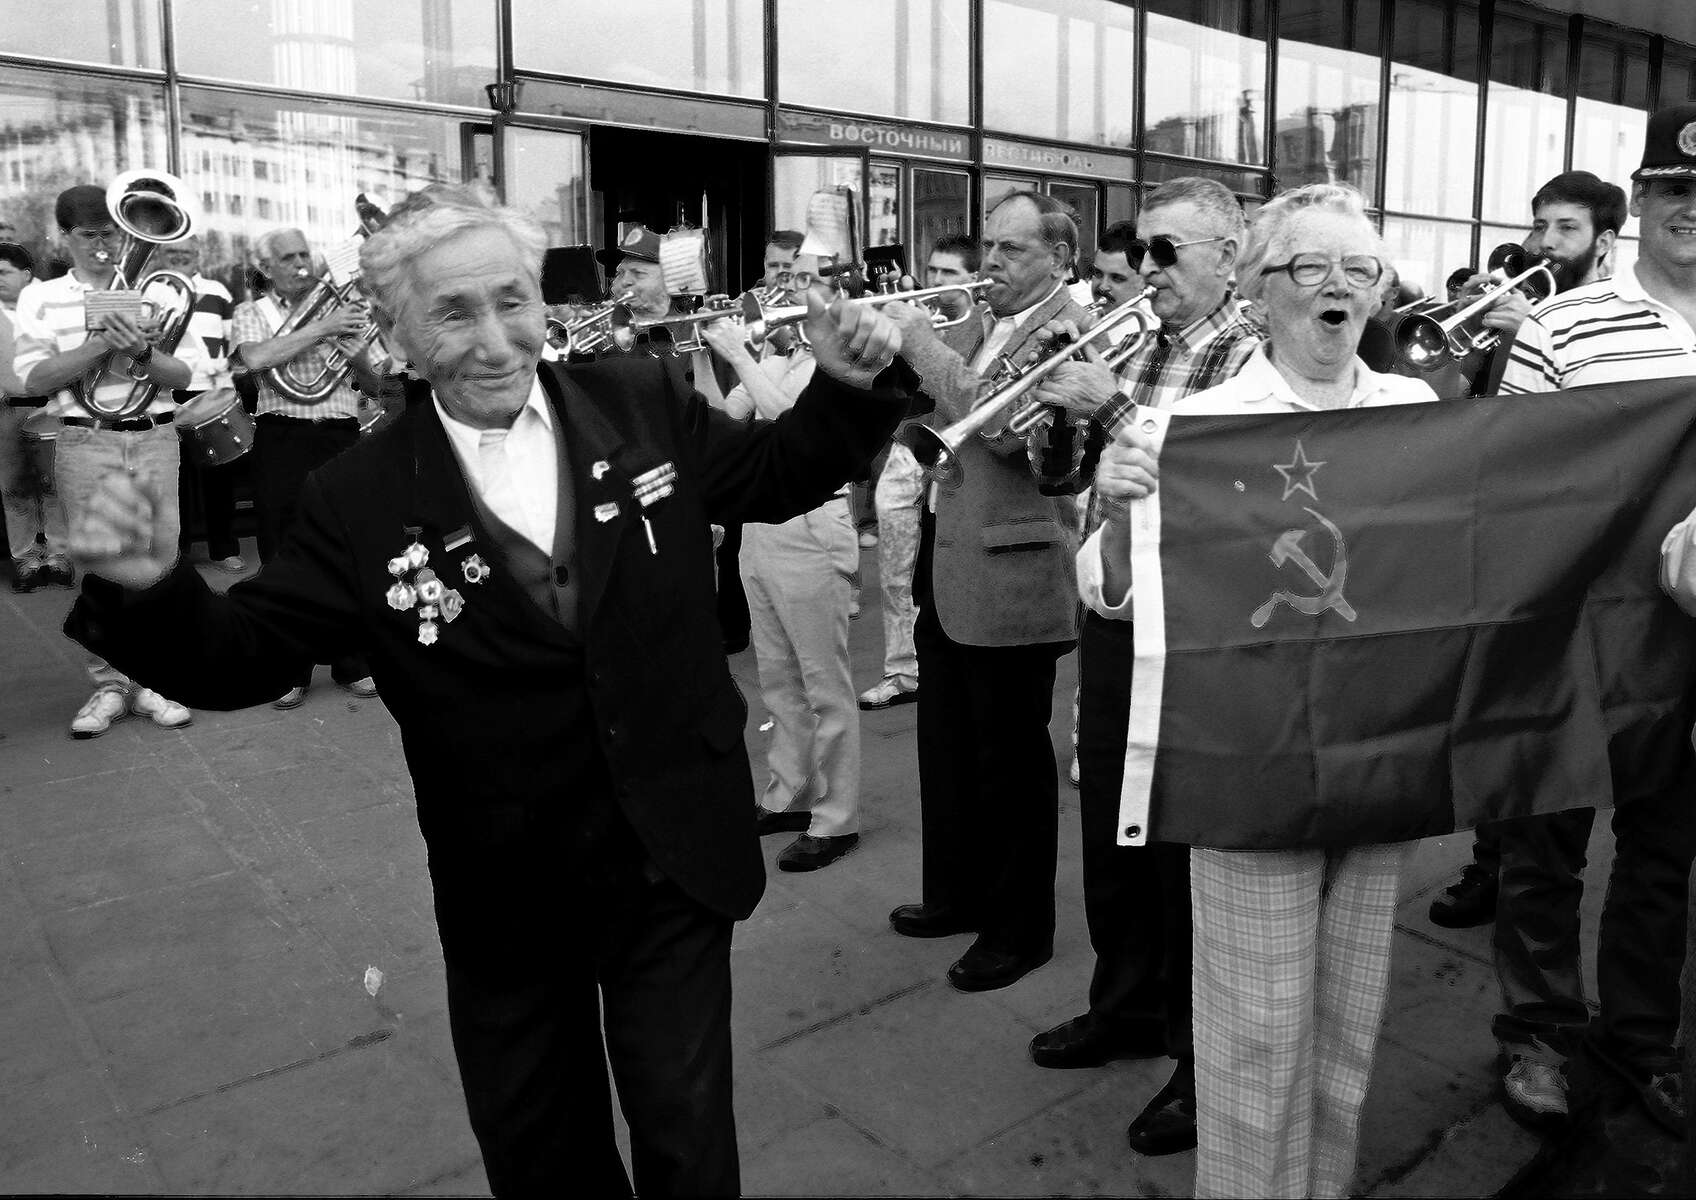 dancingmandotholdingrussianflag